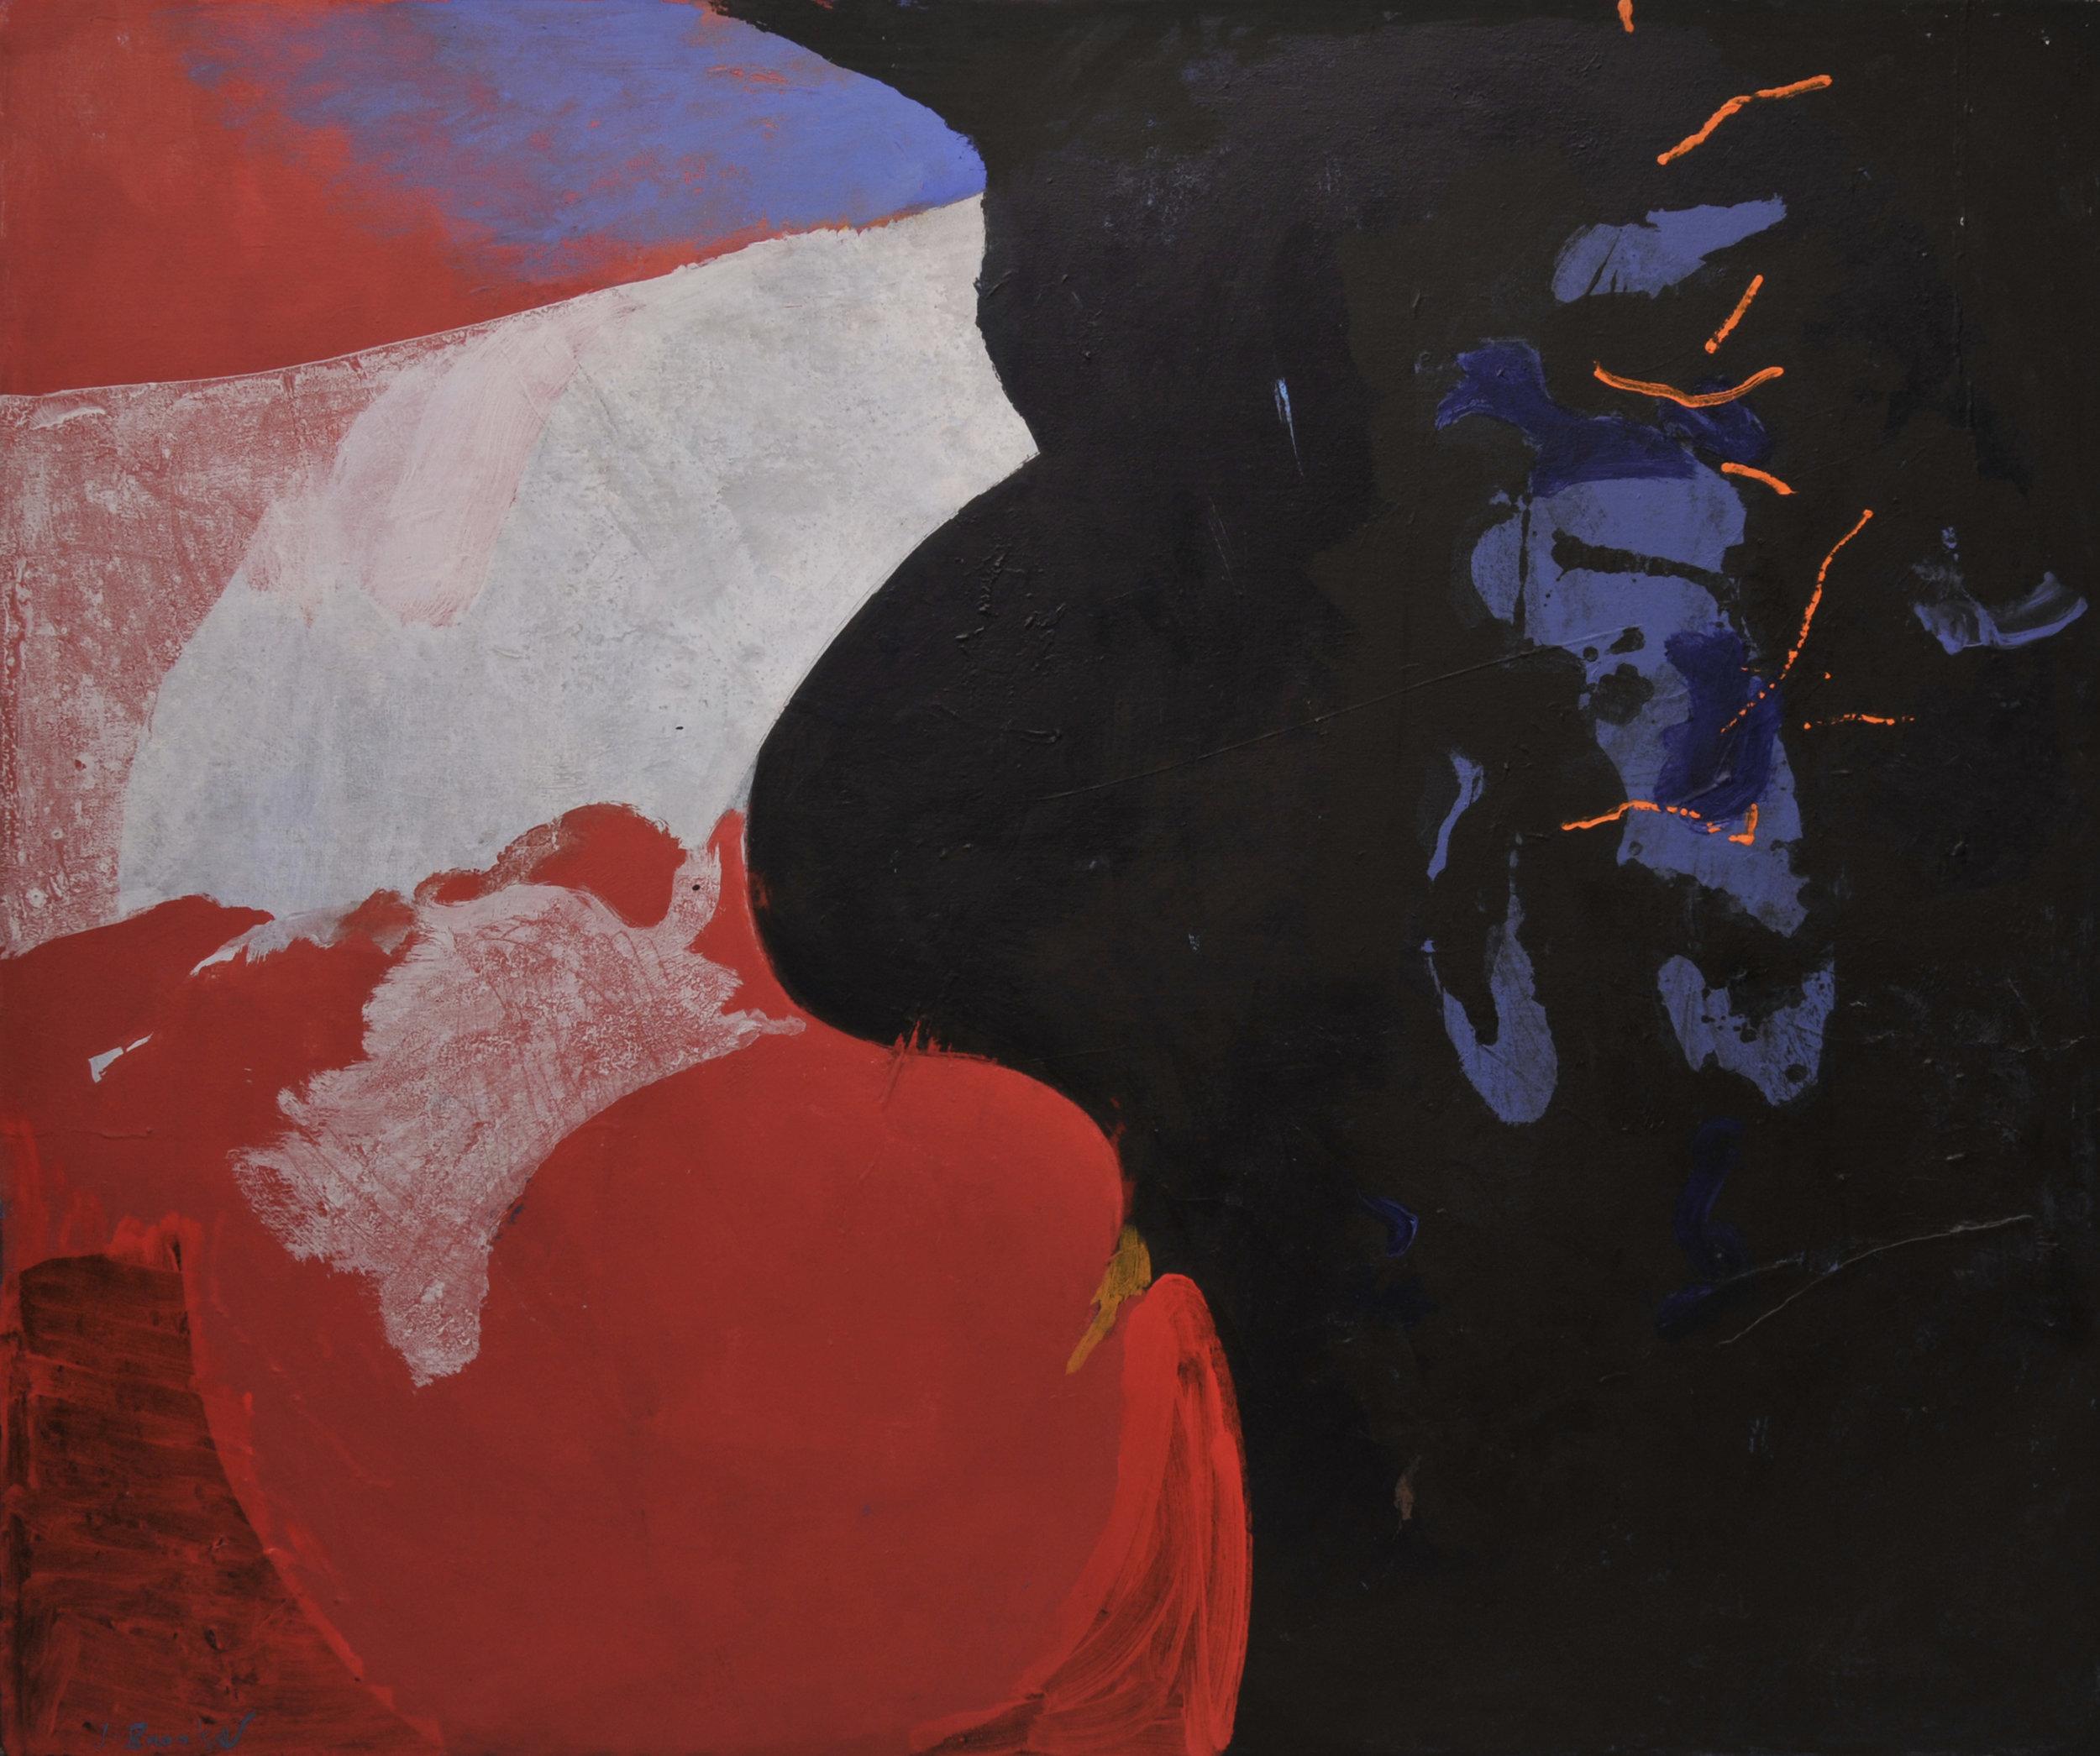 Reneel, 1967  , acrylic on canvas, 60 x 72 inches